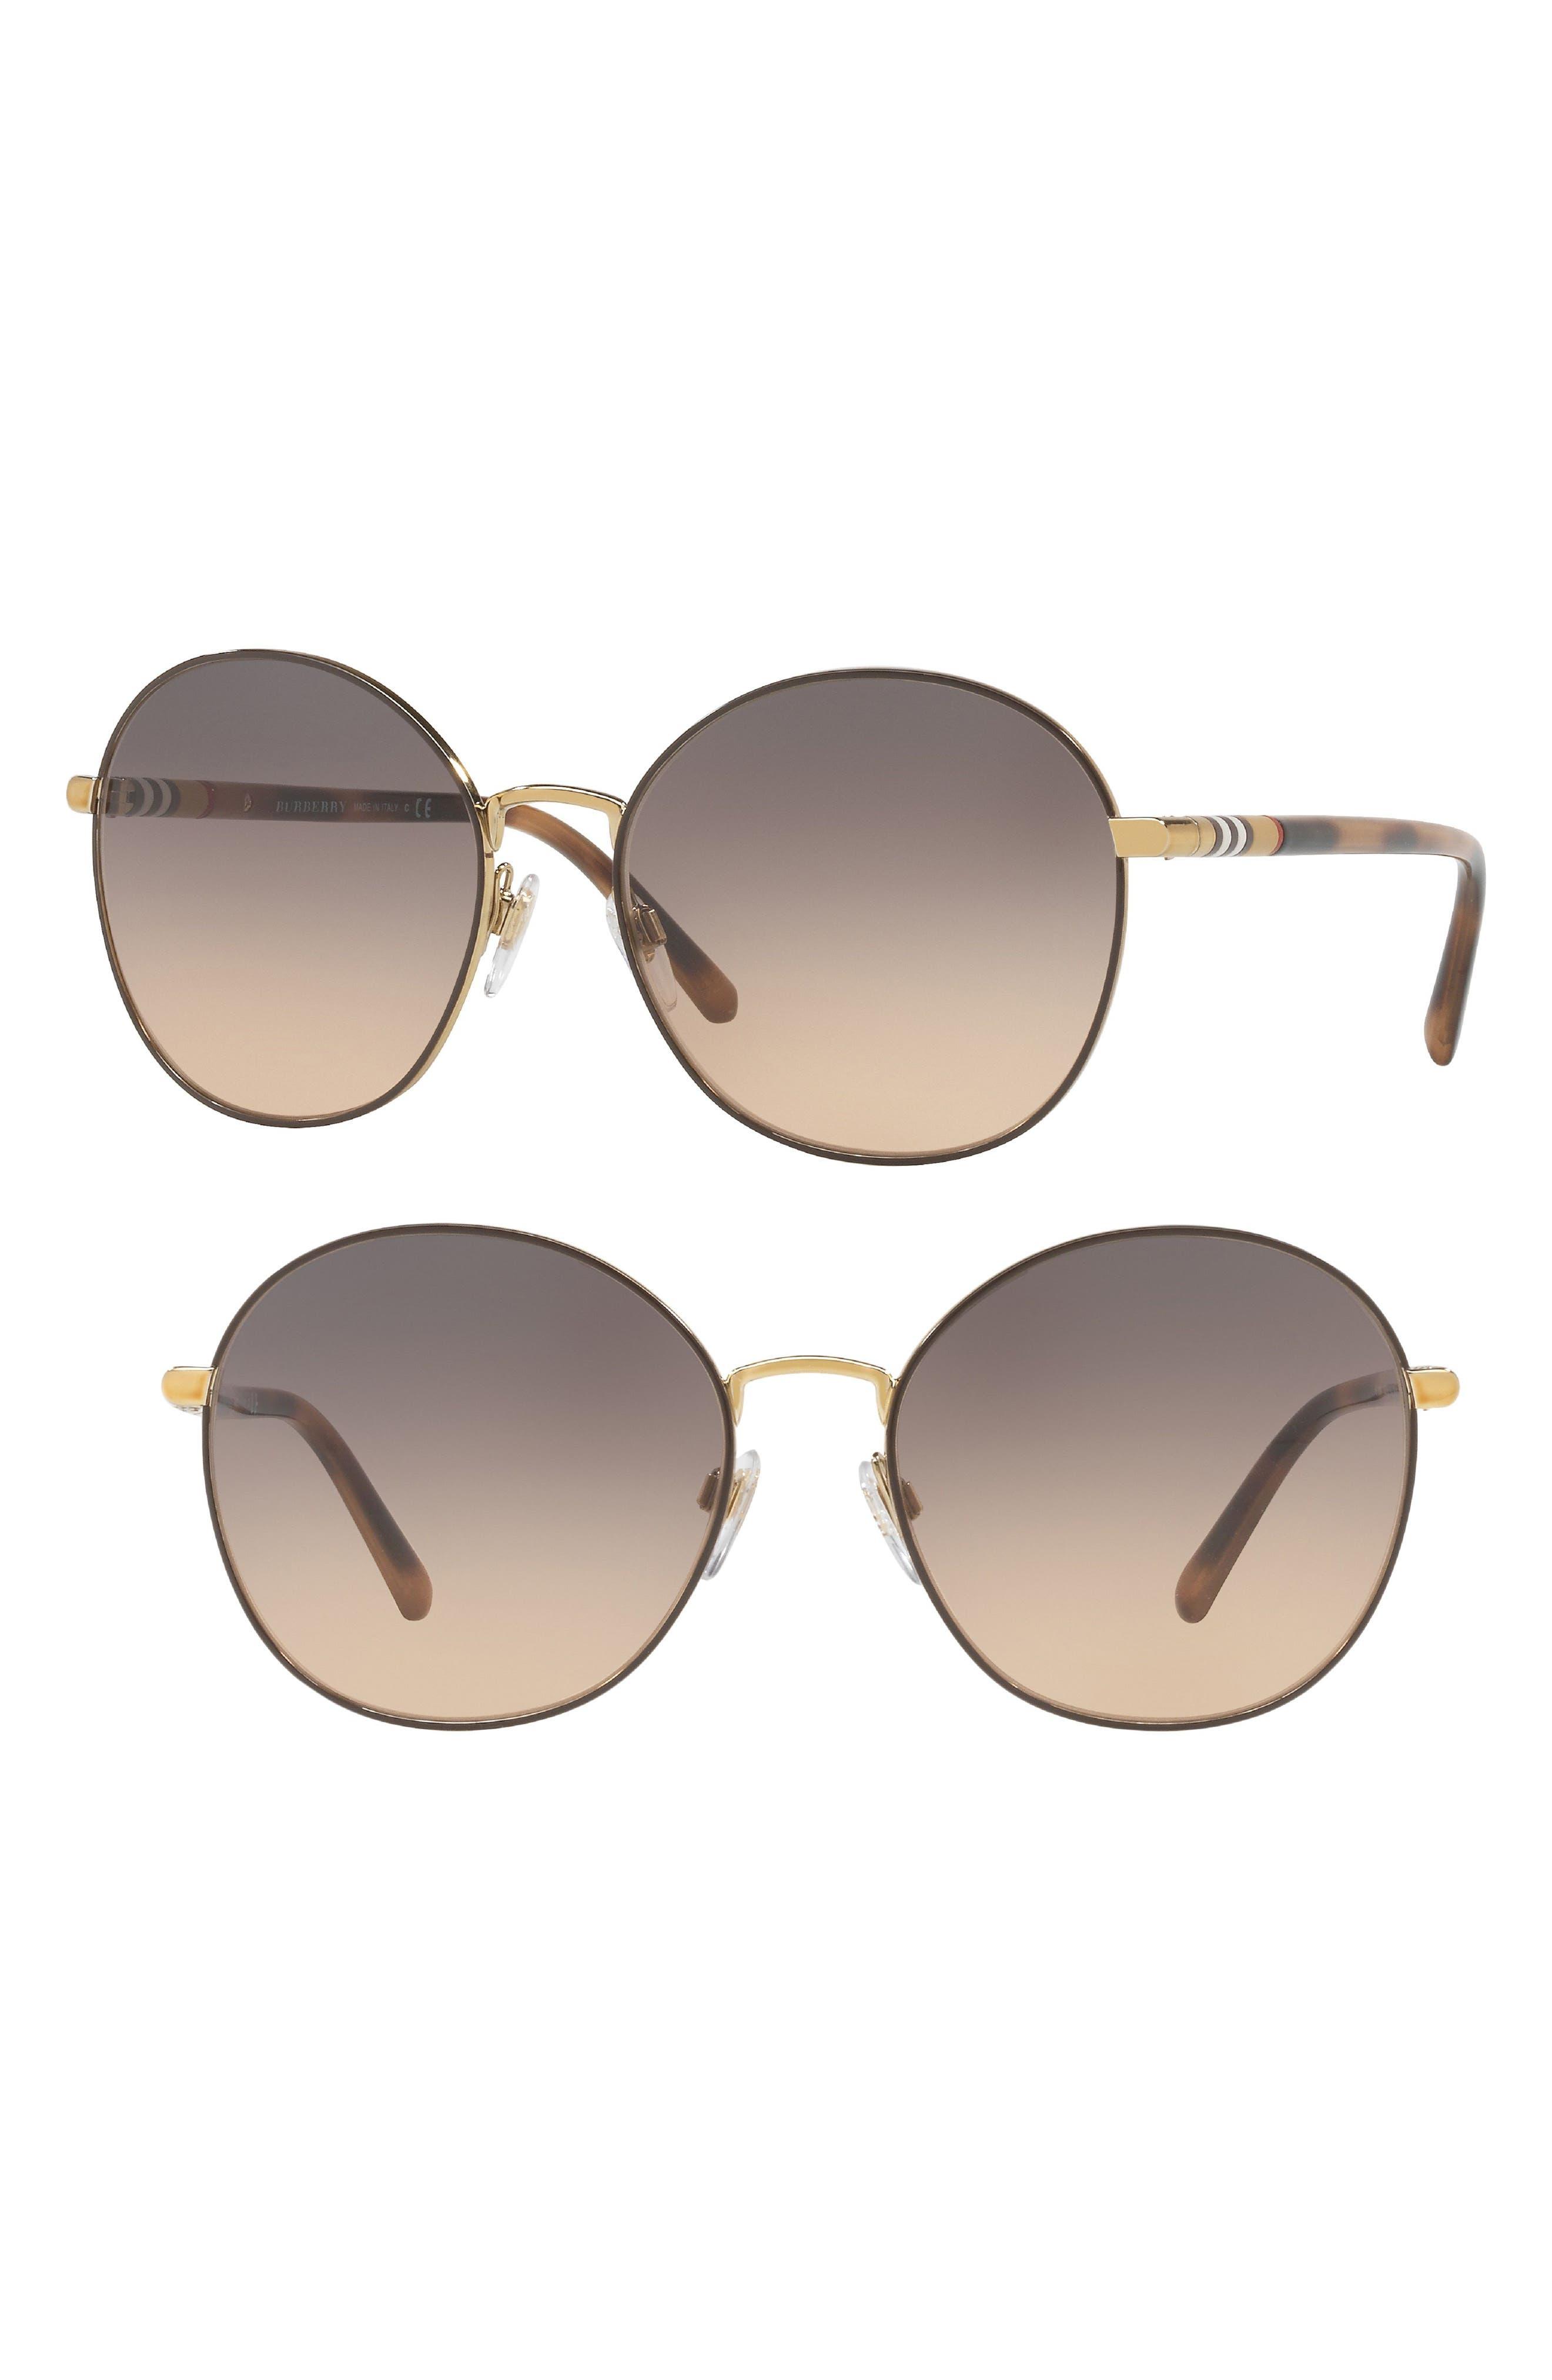 Main Image - Burberry 56mm Gradient Round Sunglasses